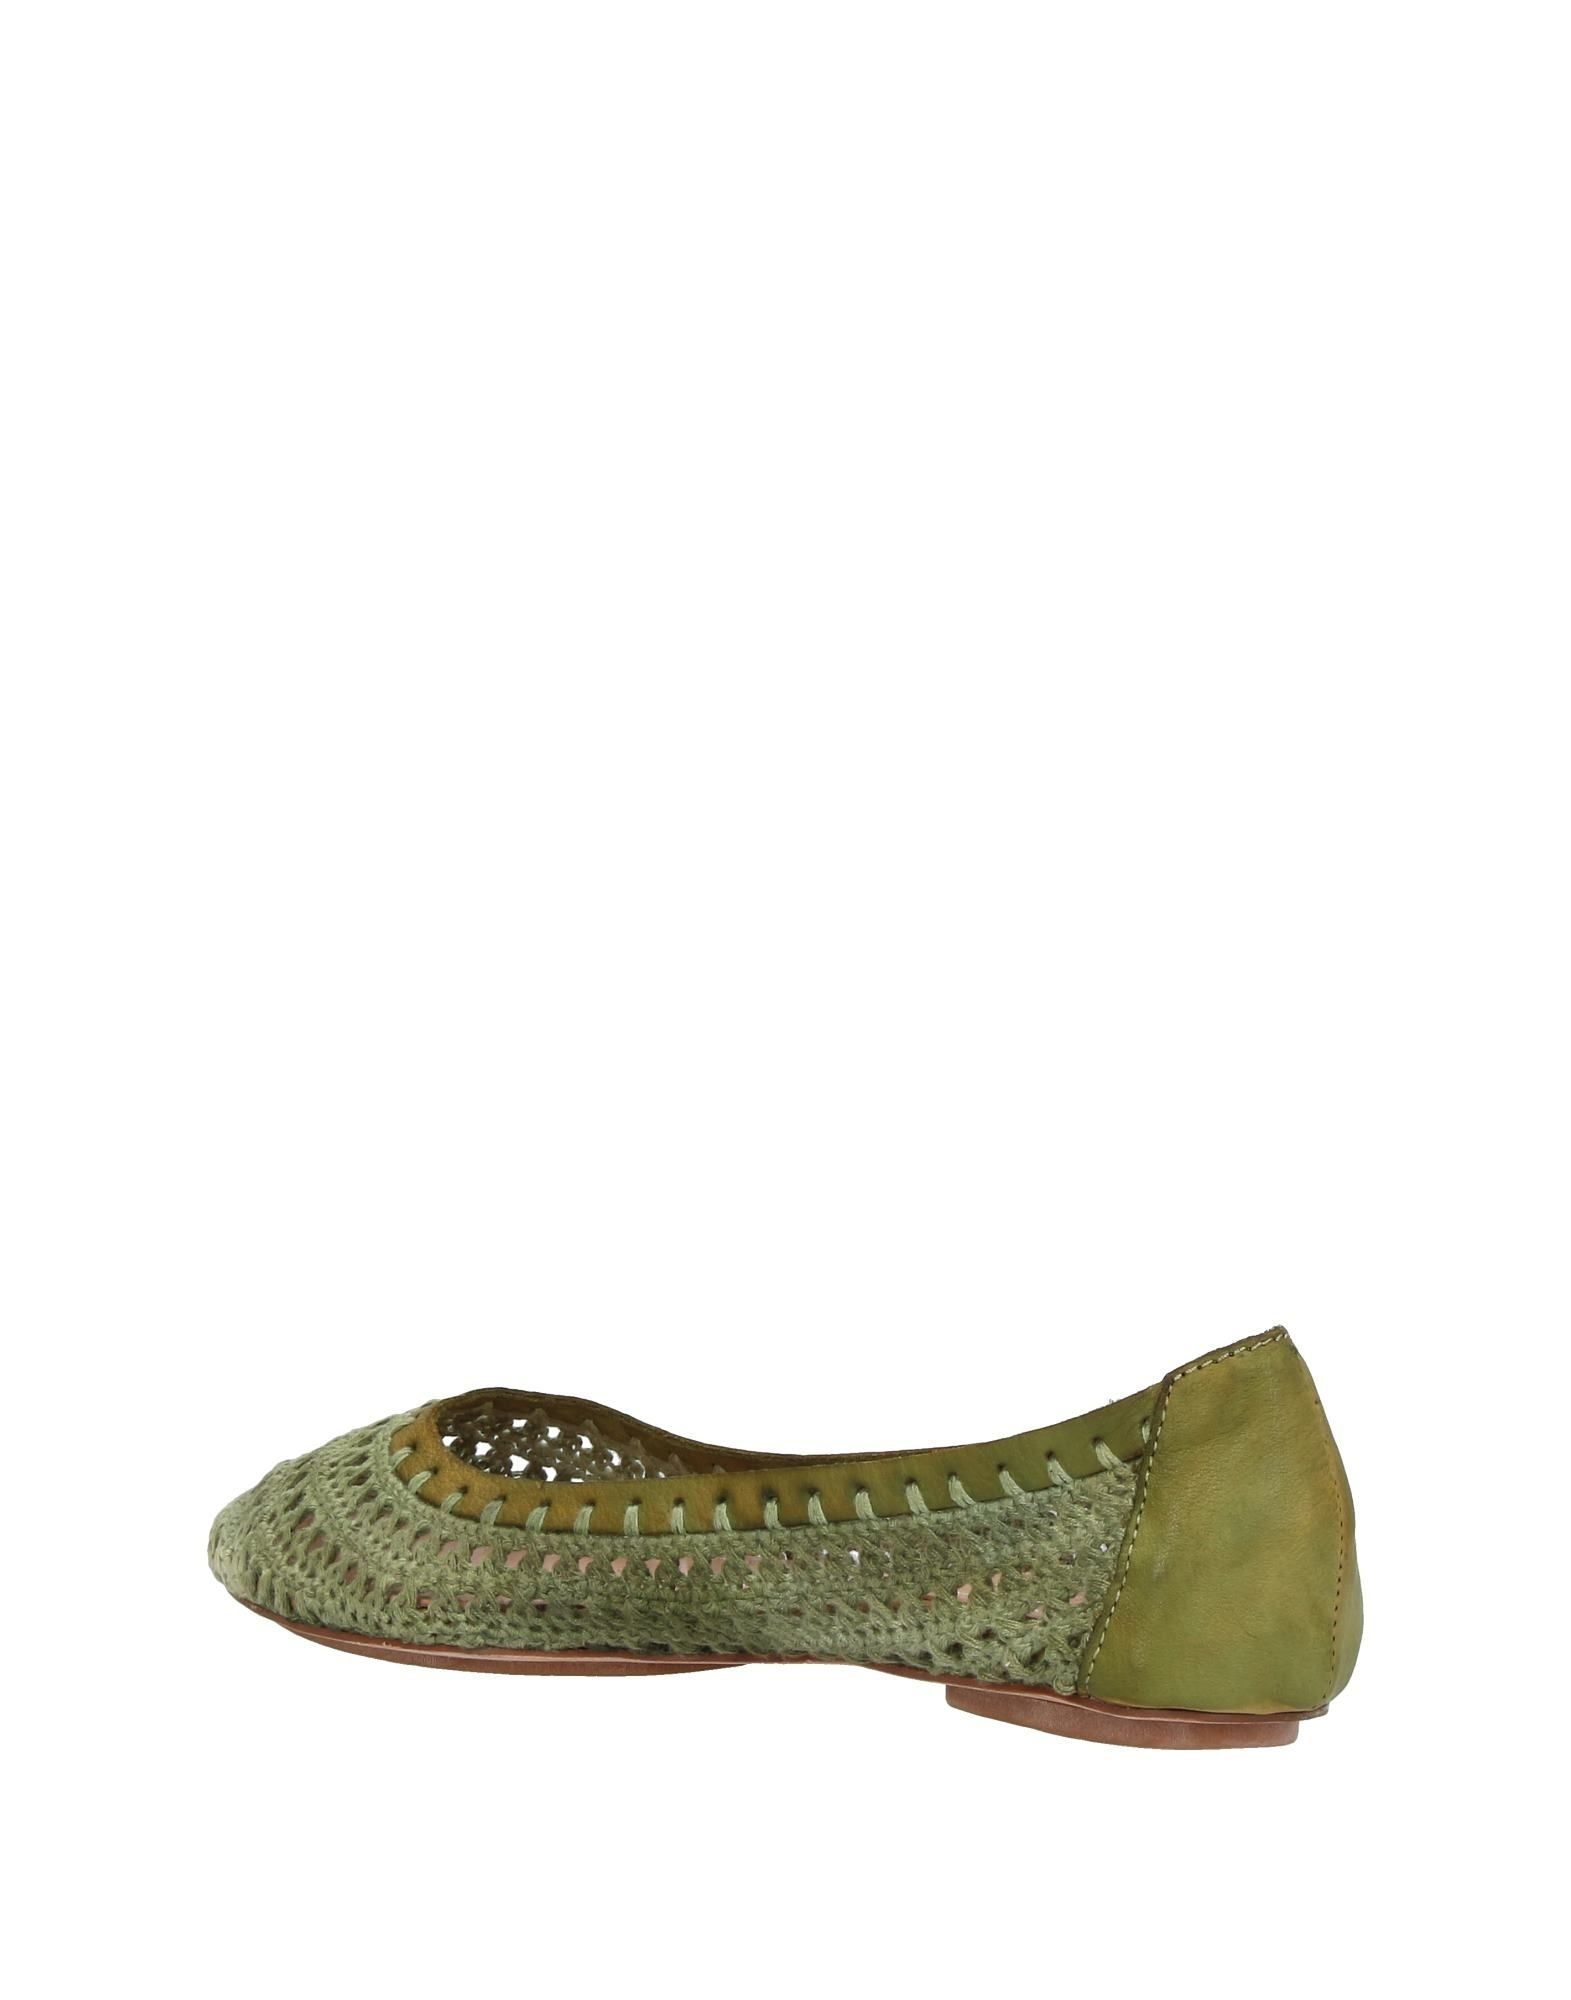 Baldinini Trend Military Green Leather Ballet Flats